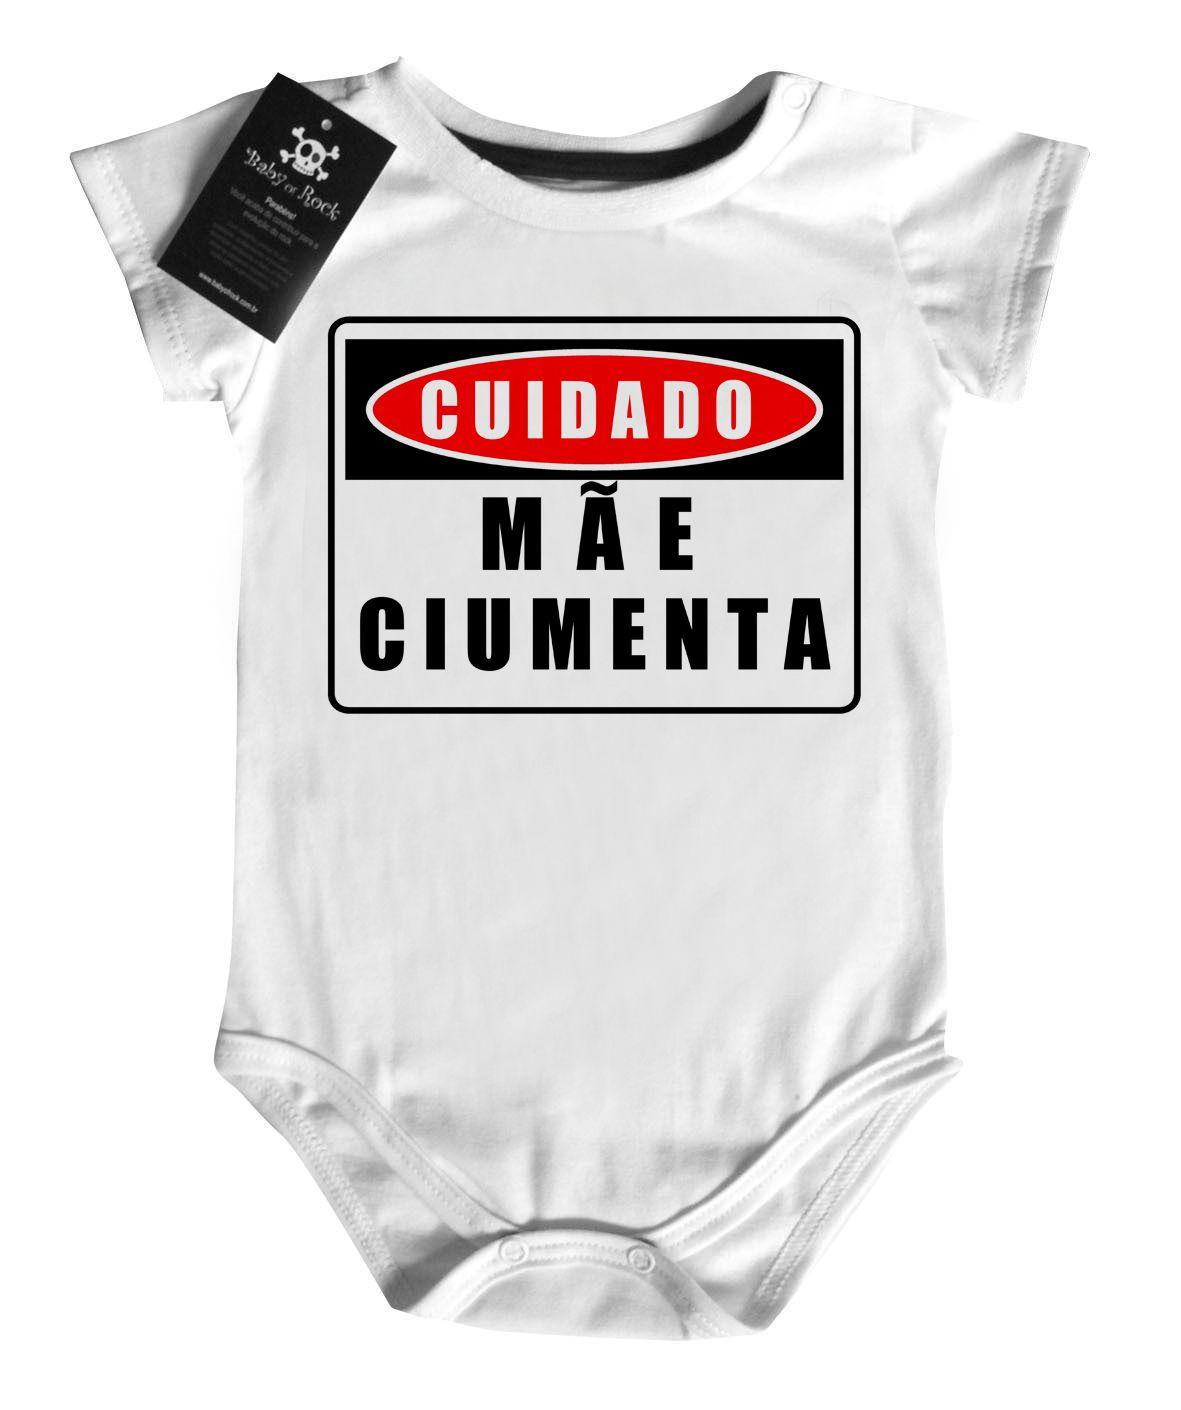 Body Divertido - Mãe Ciumenta- White  - Baby Monster S/A